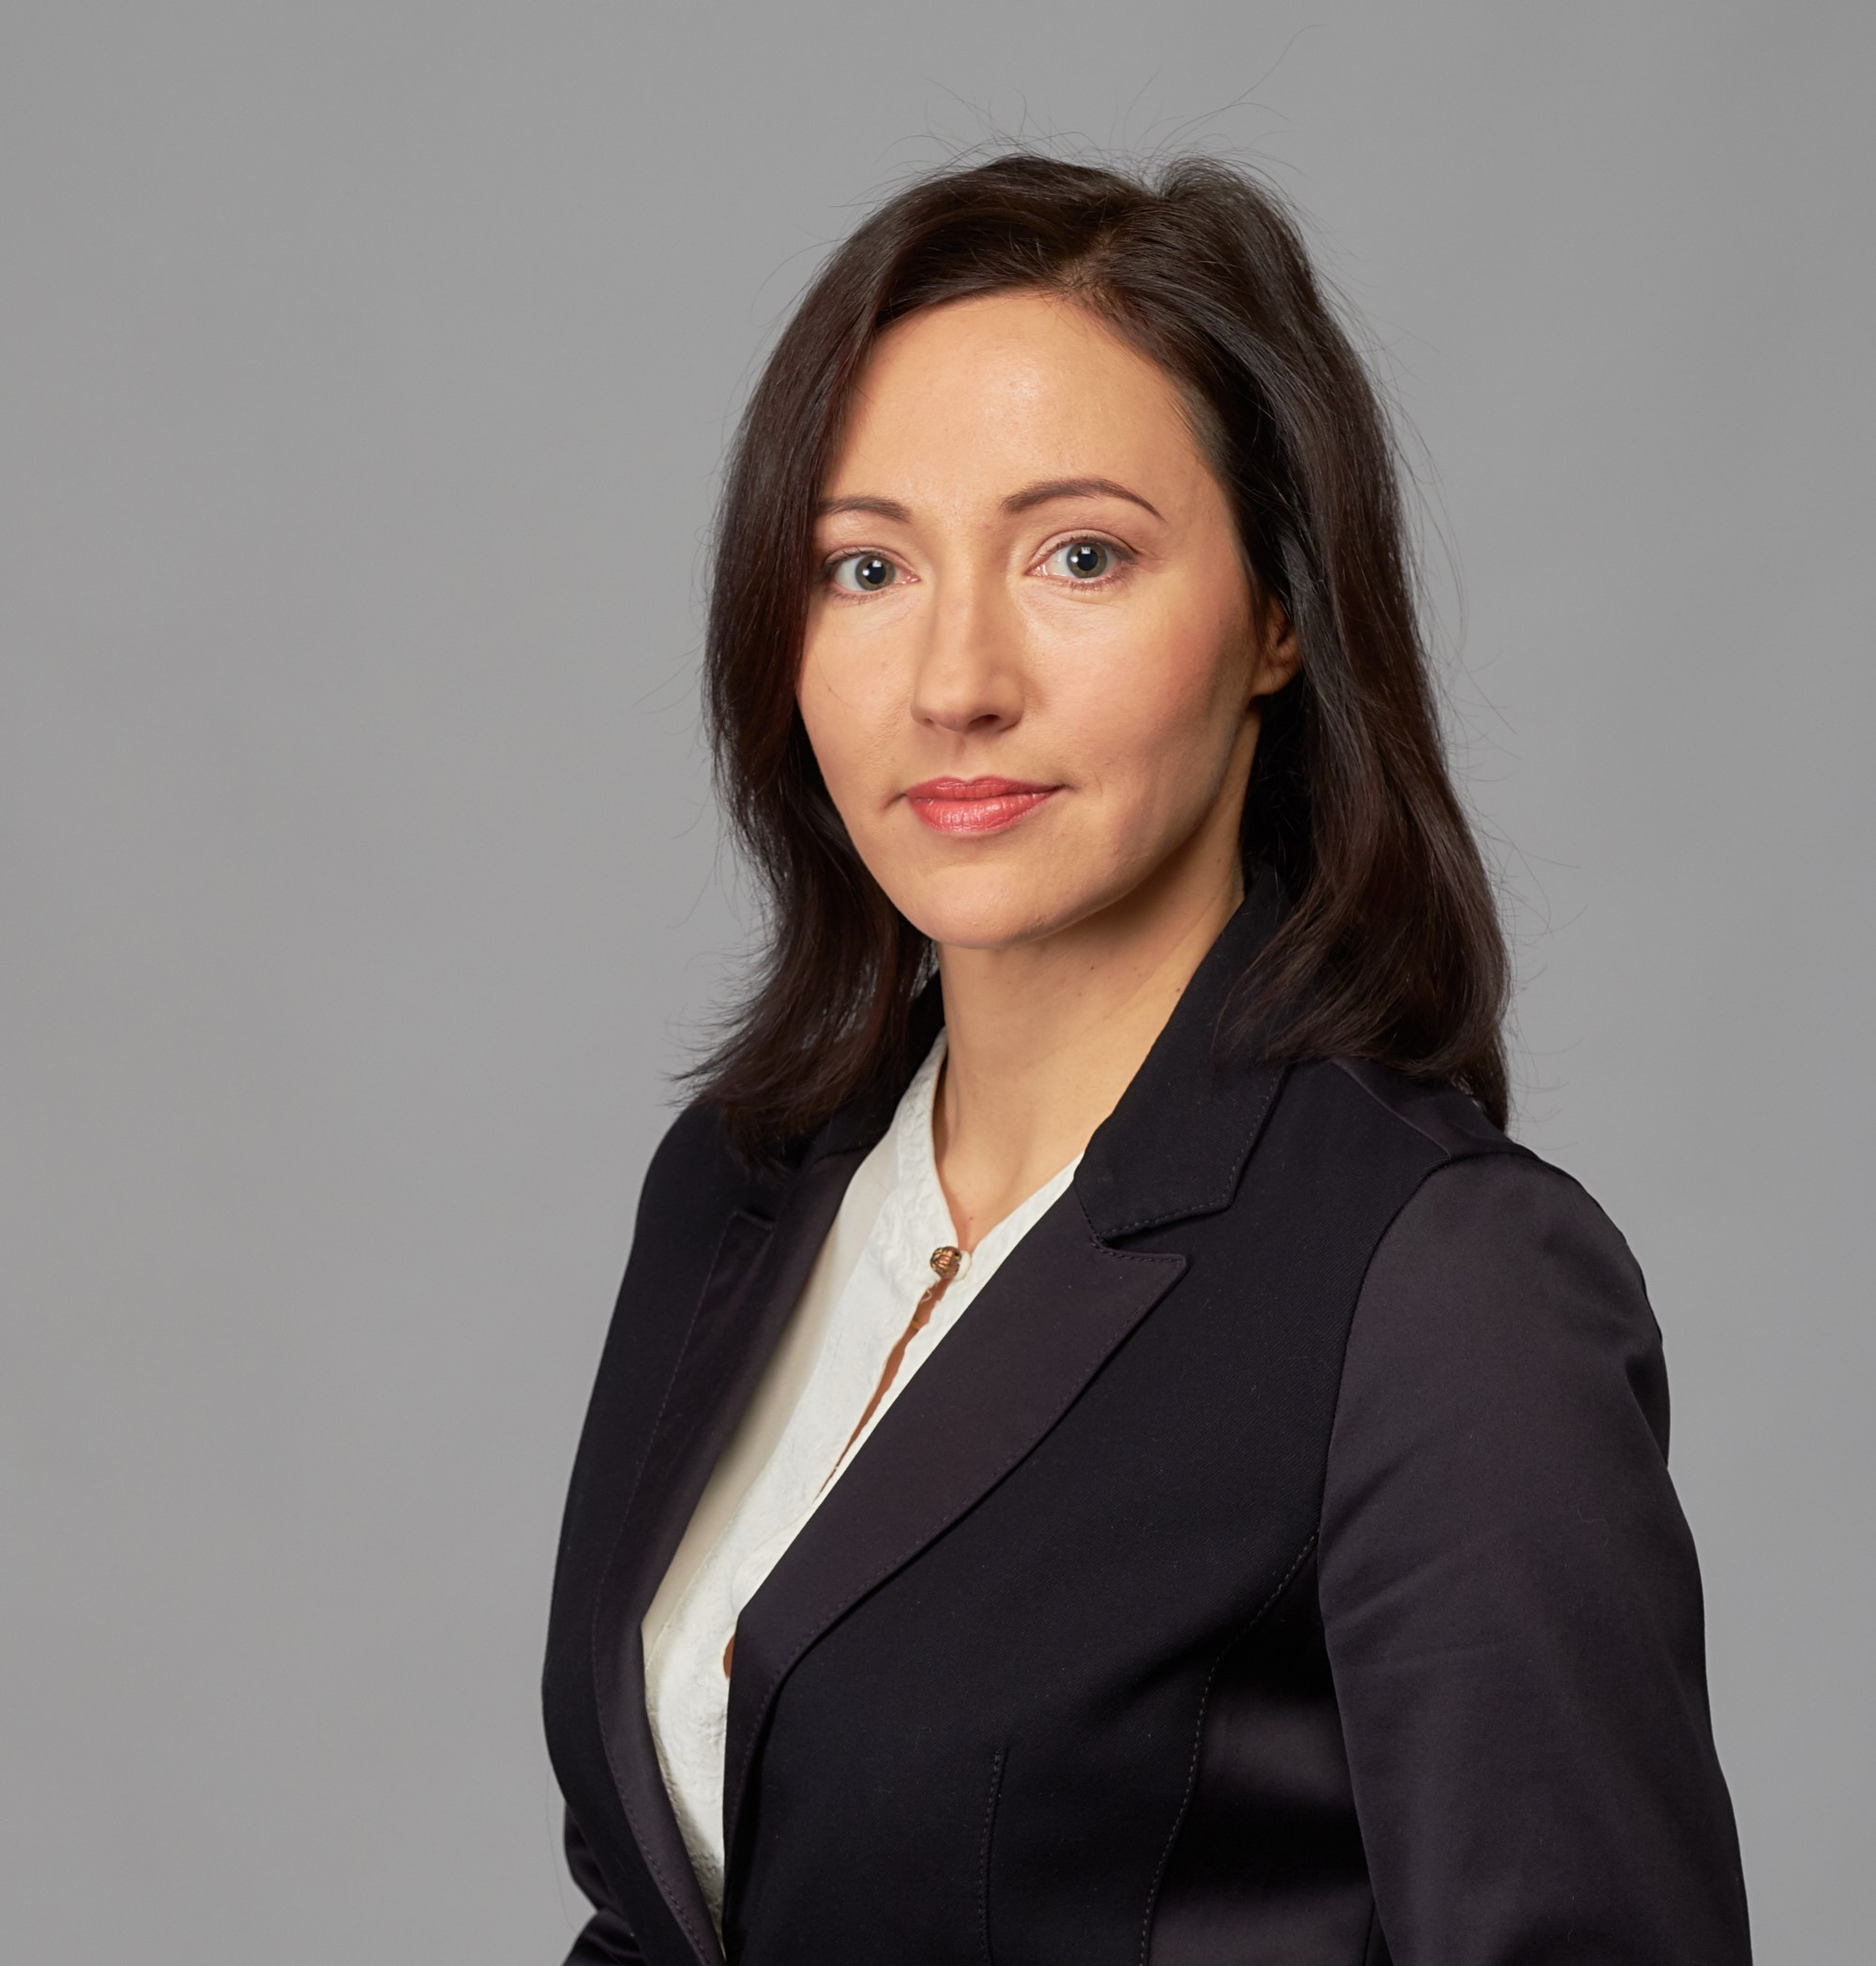 Laura Zalāna